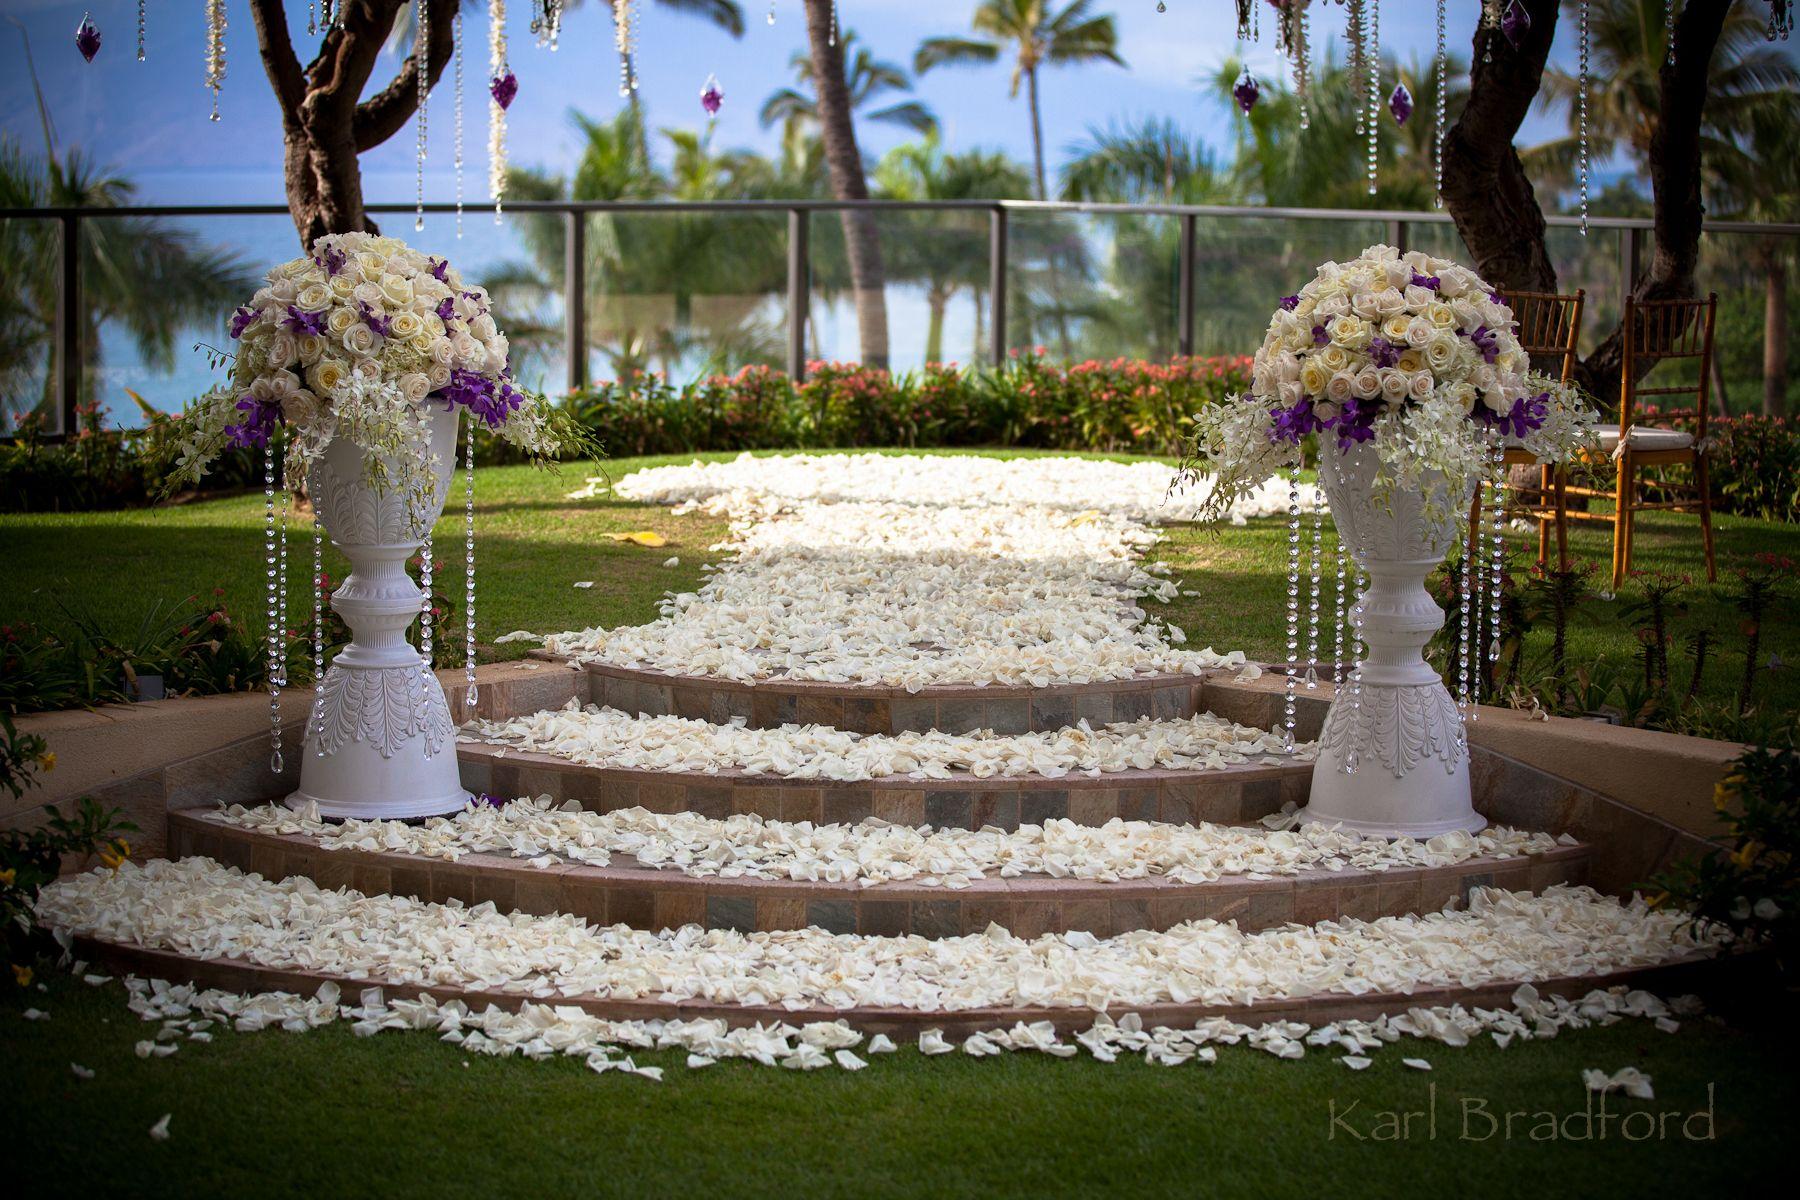 Plumeria Point Carpeted With Rose Petals Four Seasons Bridal Maui Weddings Karl